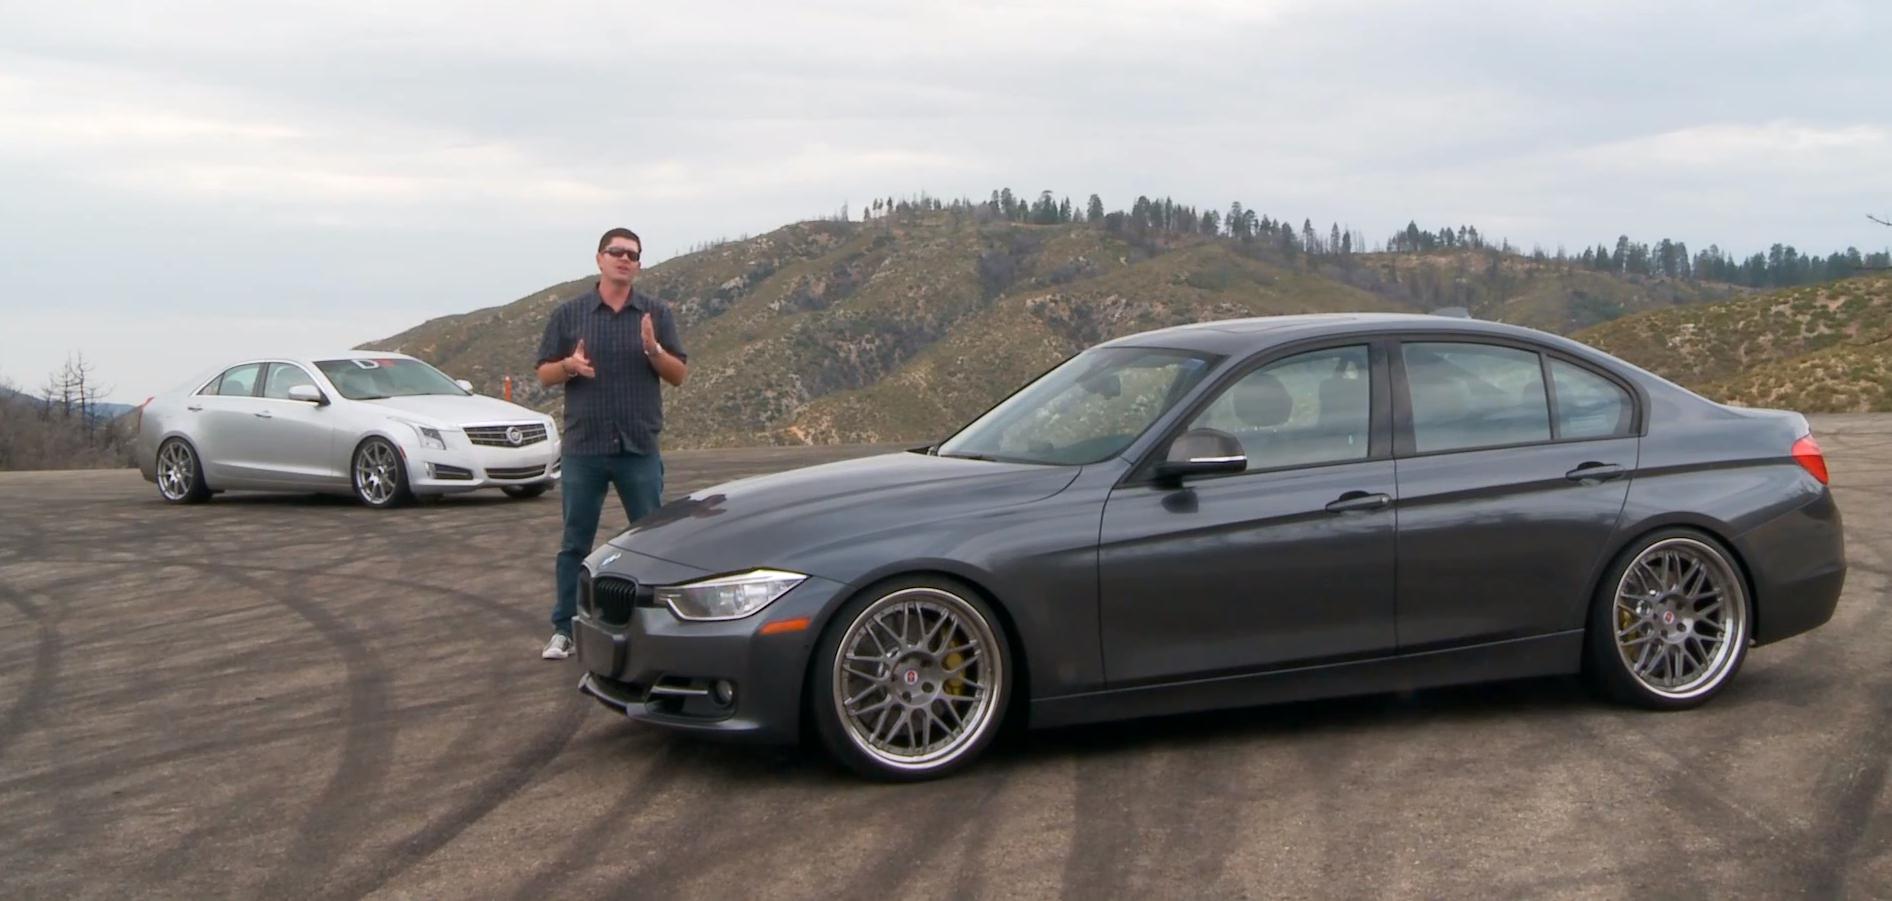 BMW Convertible lexus is350 vs bmw M Performance 335i vs D3 Cadillac ATS Comparison - autoevolution